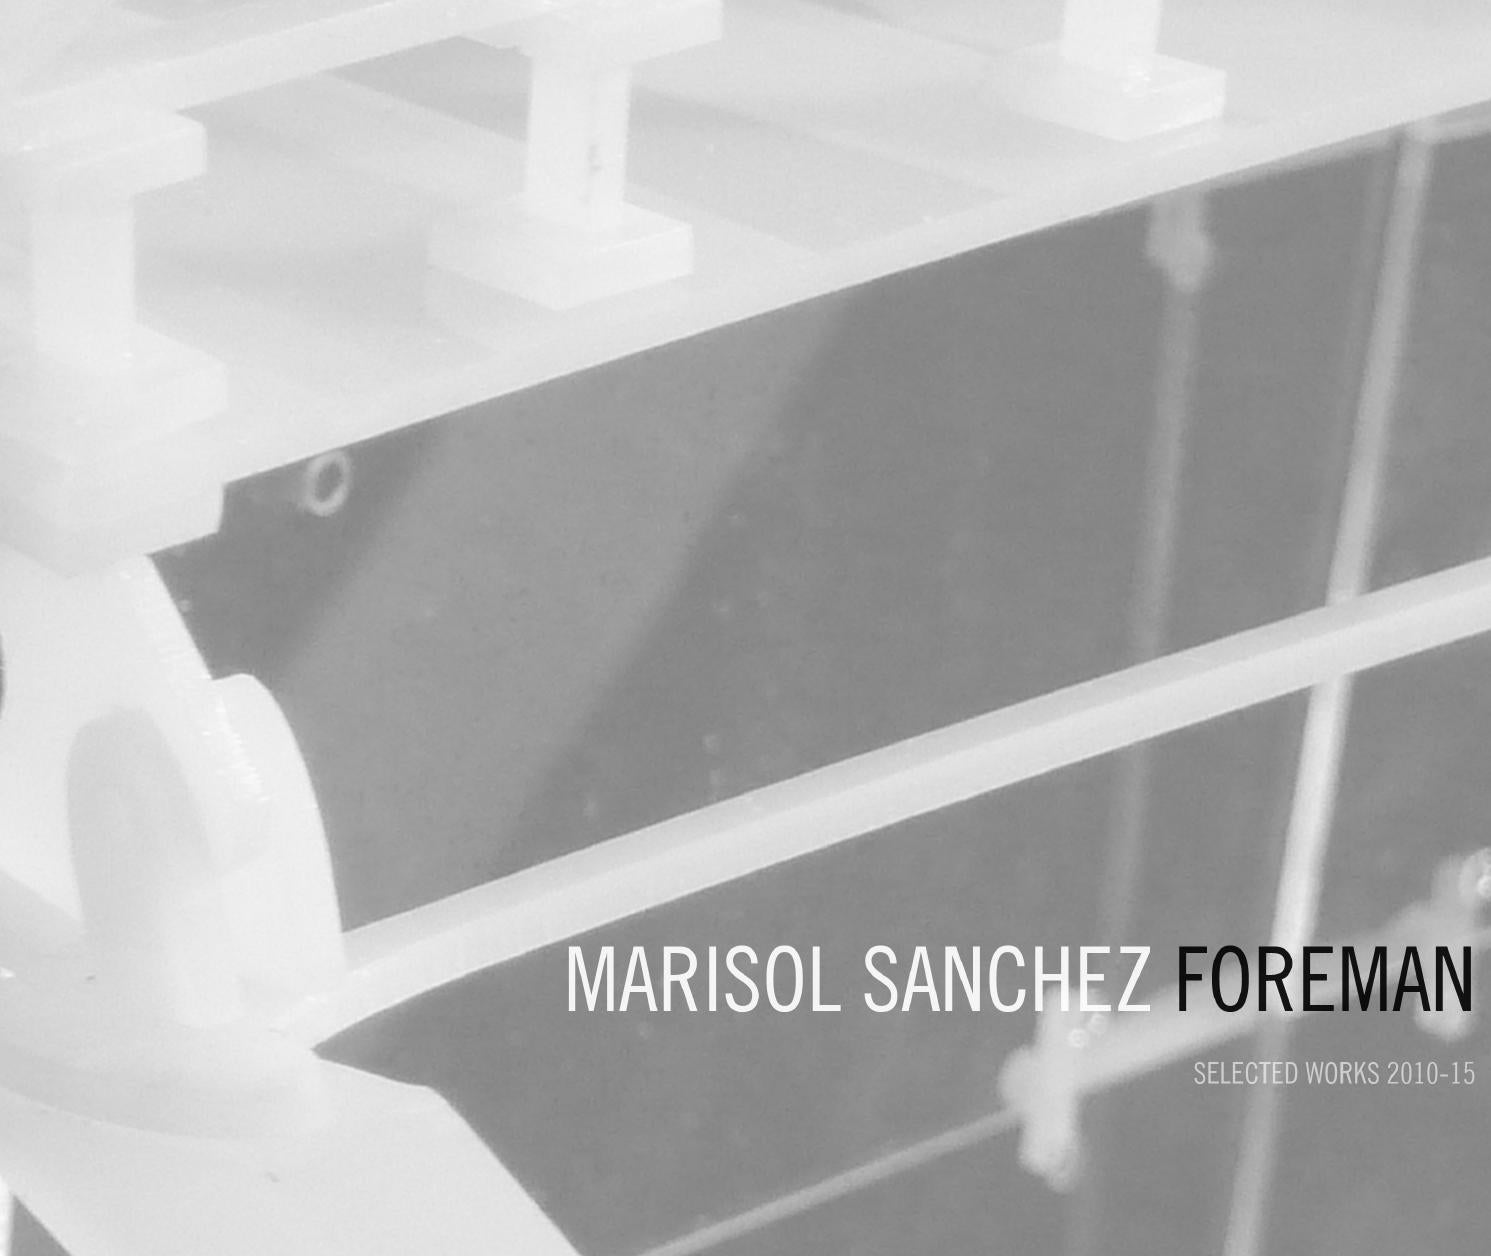 marisol sanchez foreman by marisol foreman